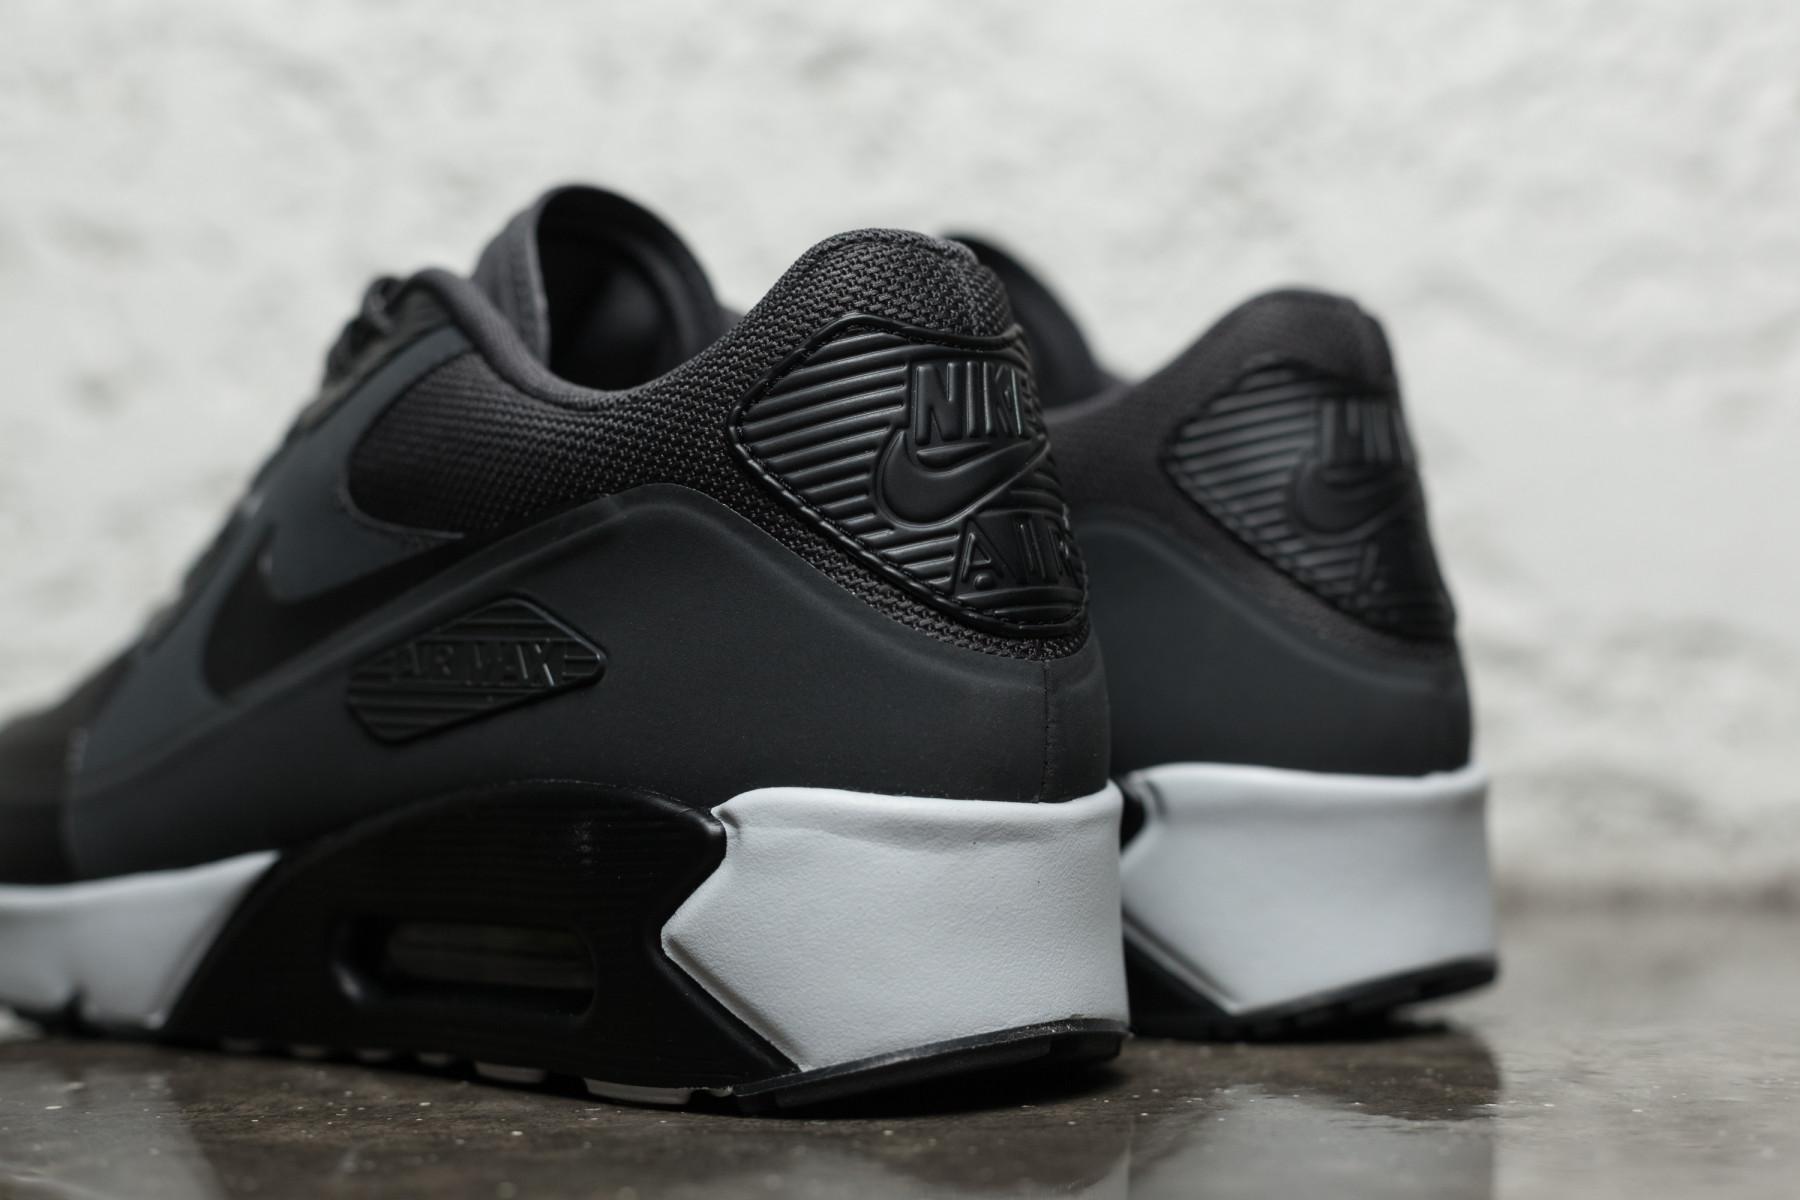 Nike Air Max 90 Ultra 2.0 SE Herre Sneakers Sneaker.no